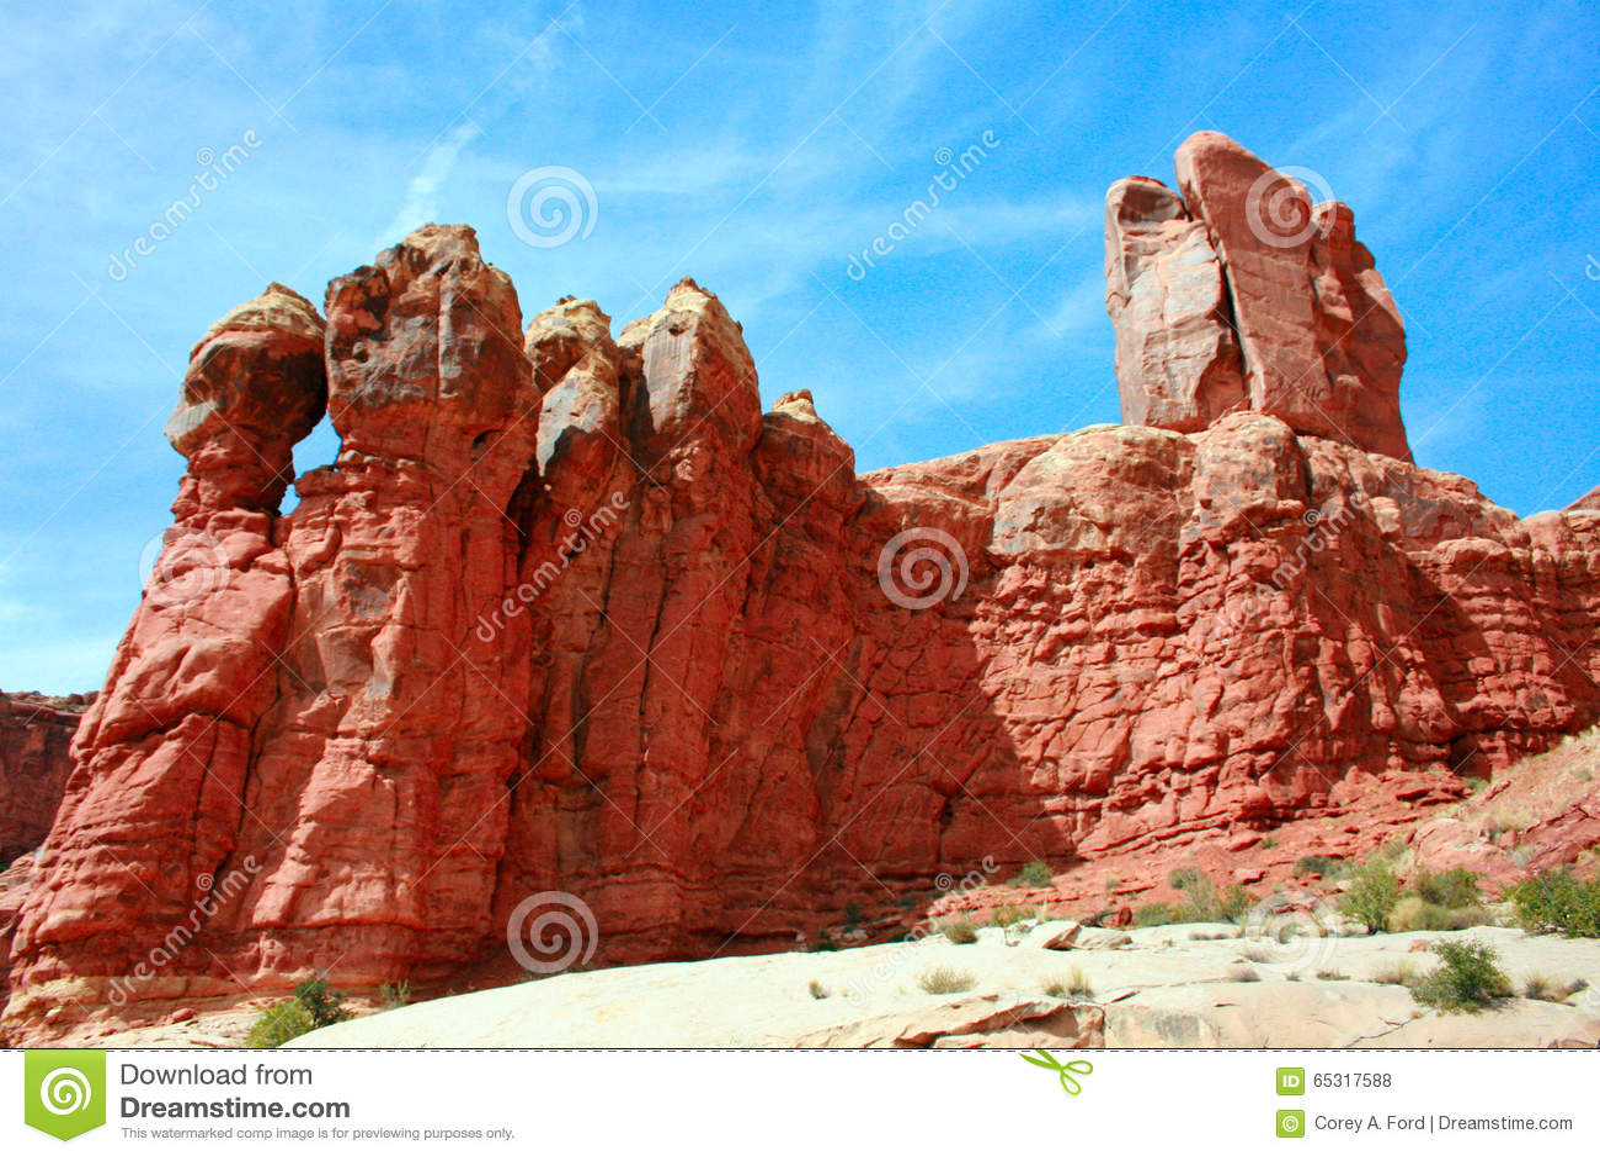 Garden Of Eden Arches National Park Utah Usa Stock Illustration Image 65317588